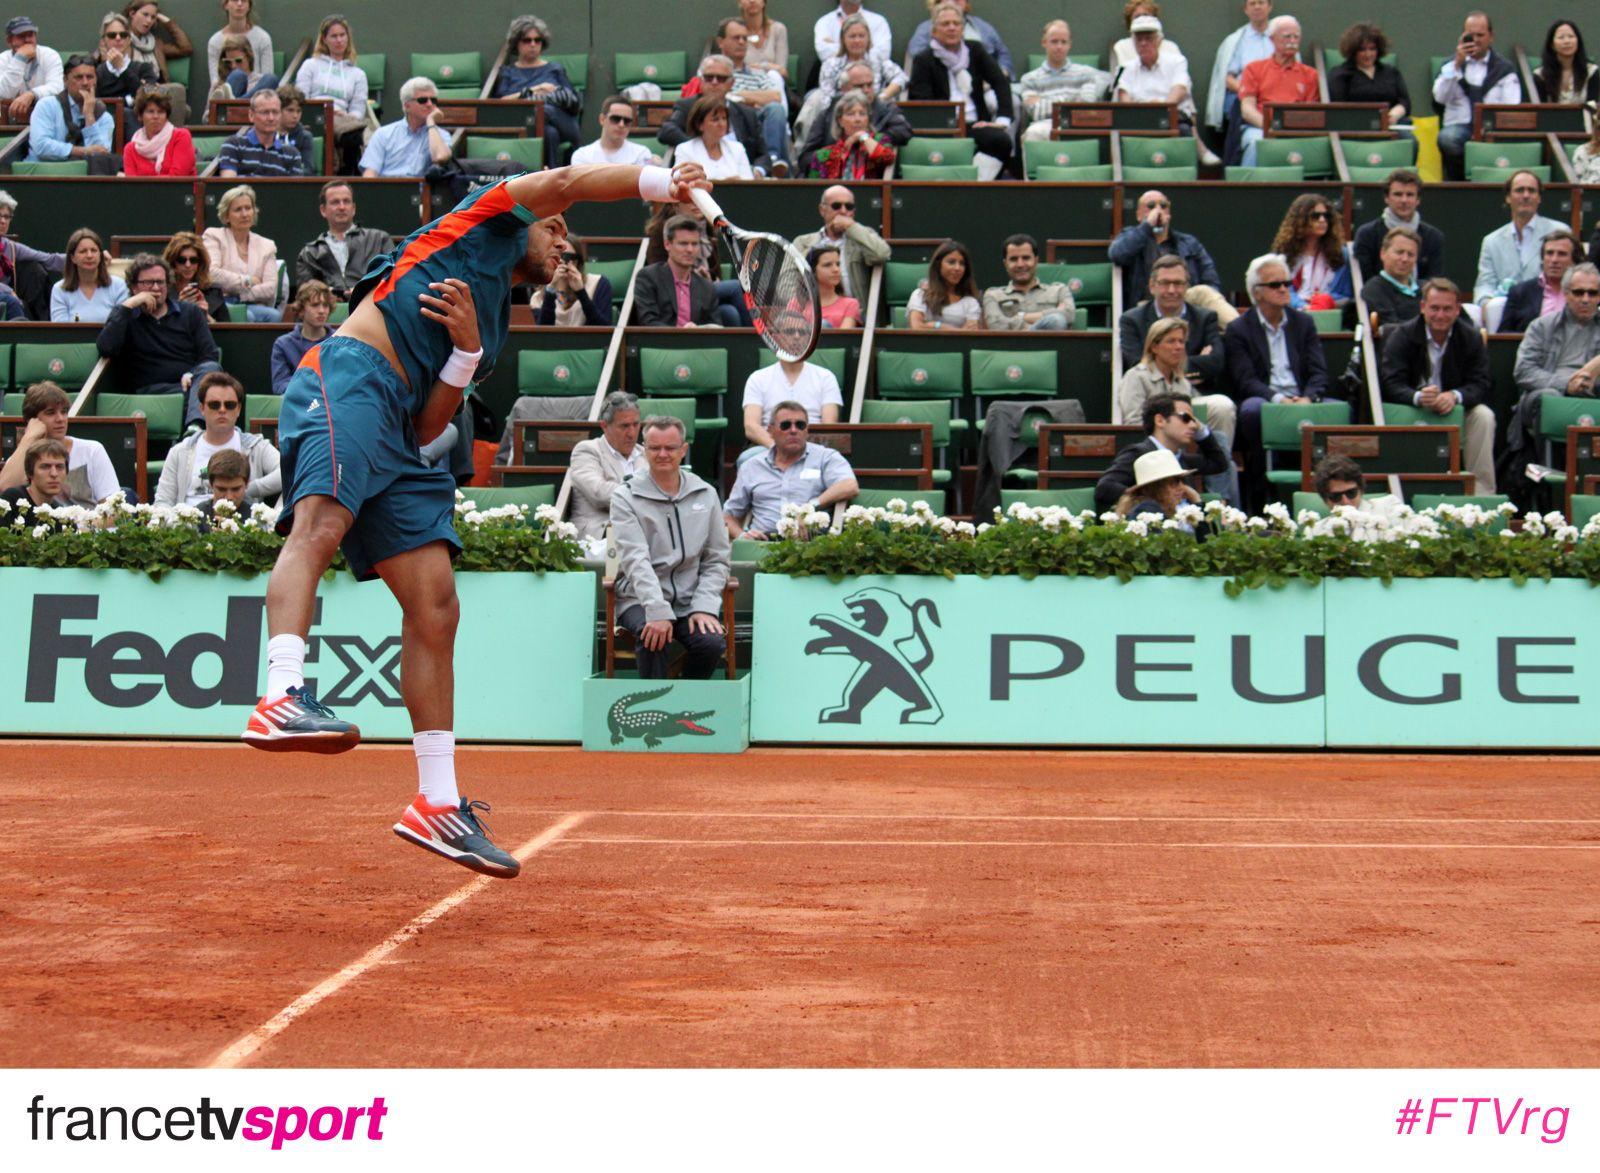 Épinglé sur Roland Garros